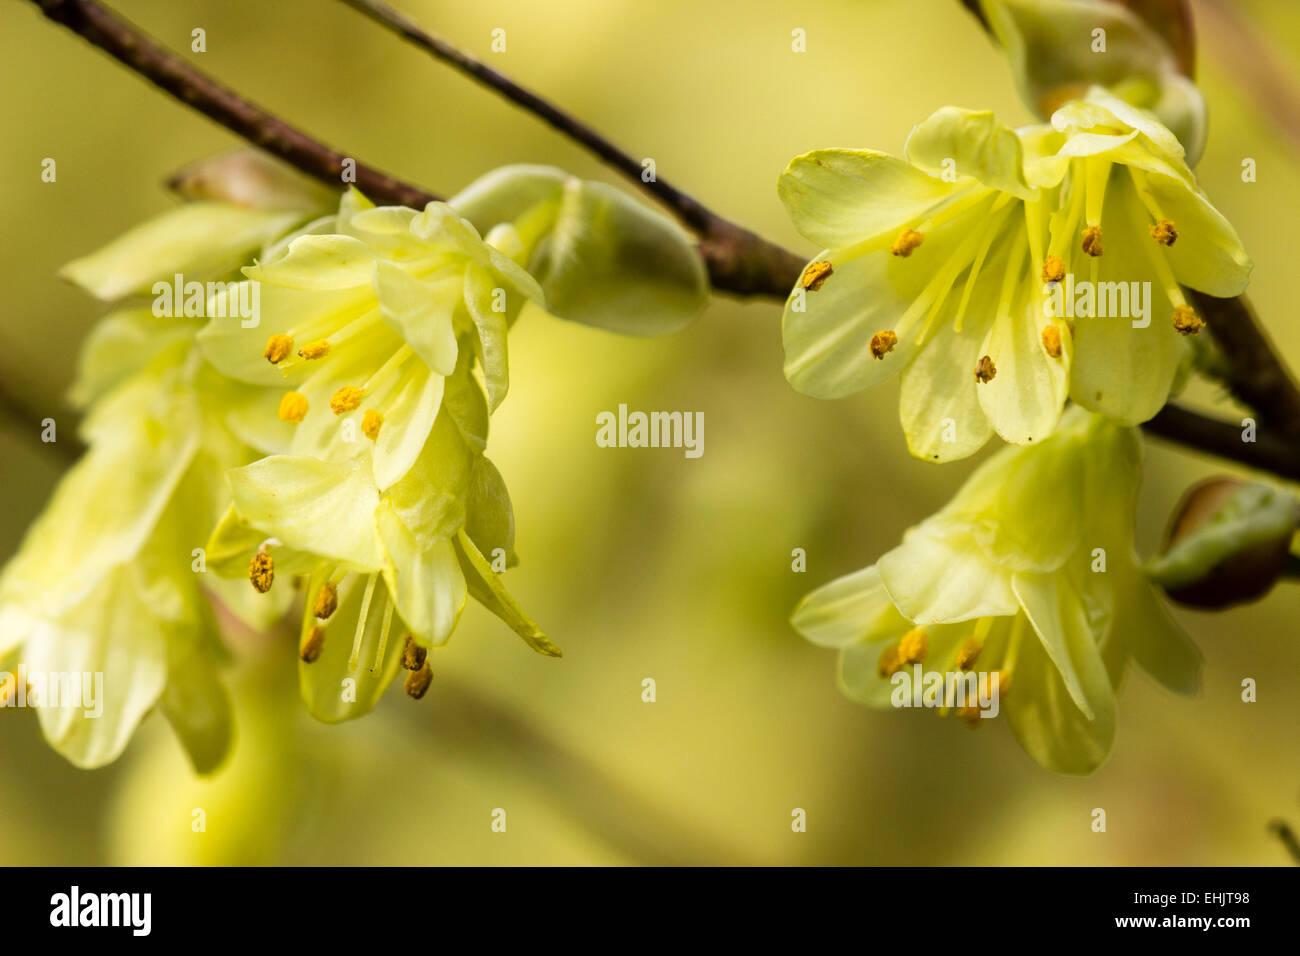 Flowers Of The Early Spring Flowering Shrub Corylopsis Pauciflora